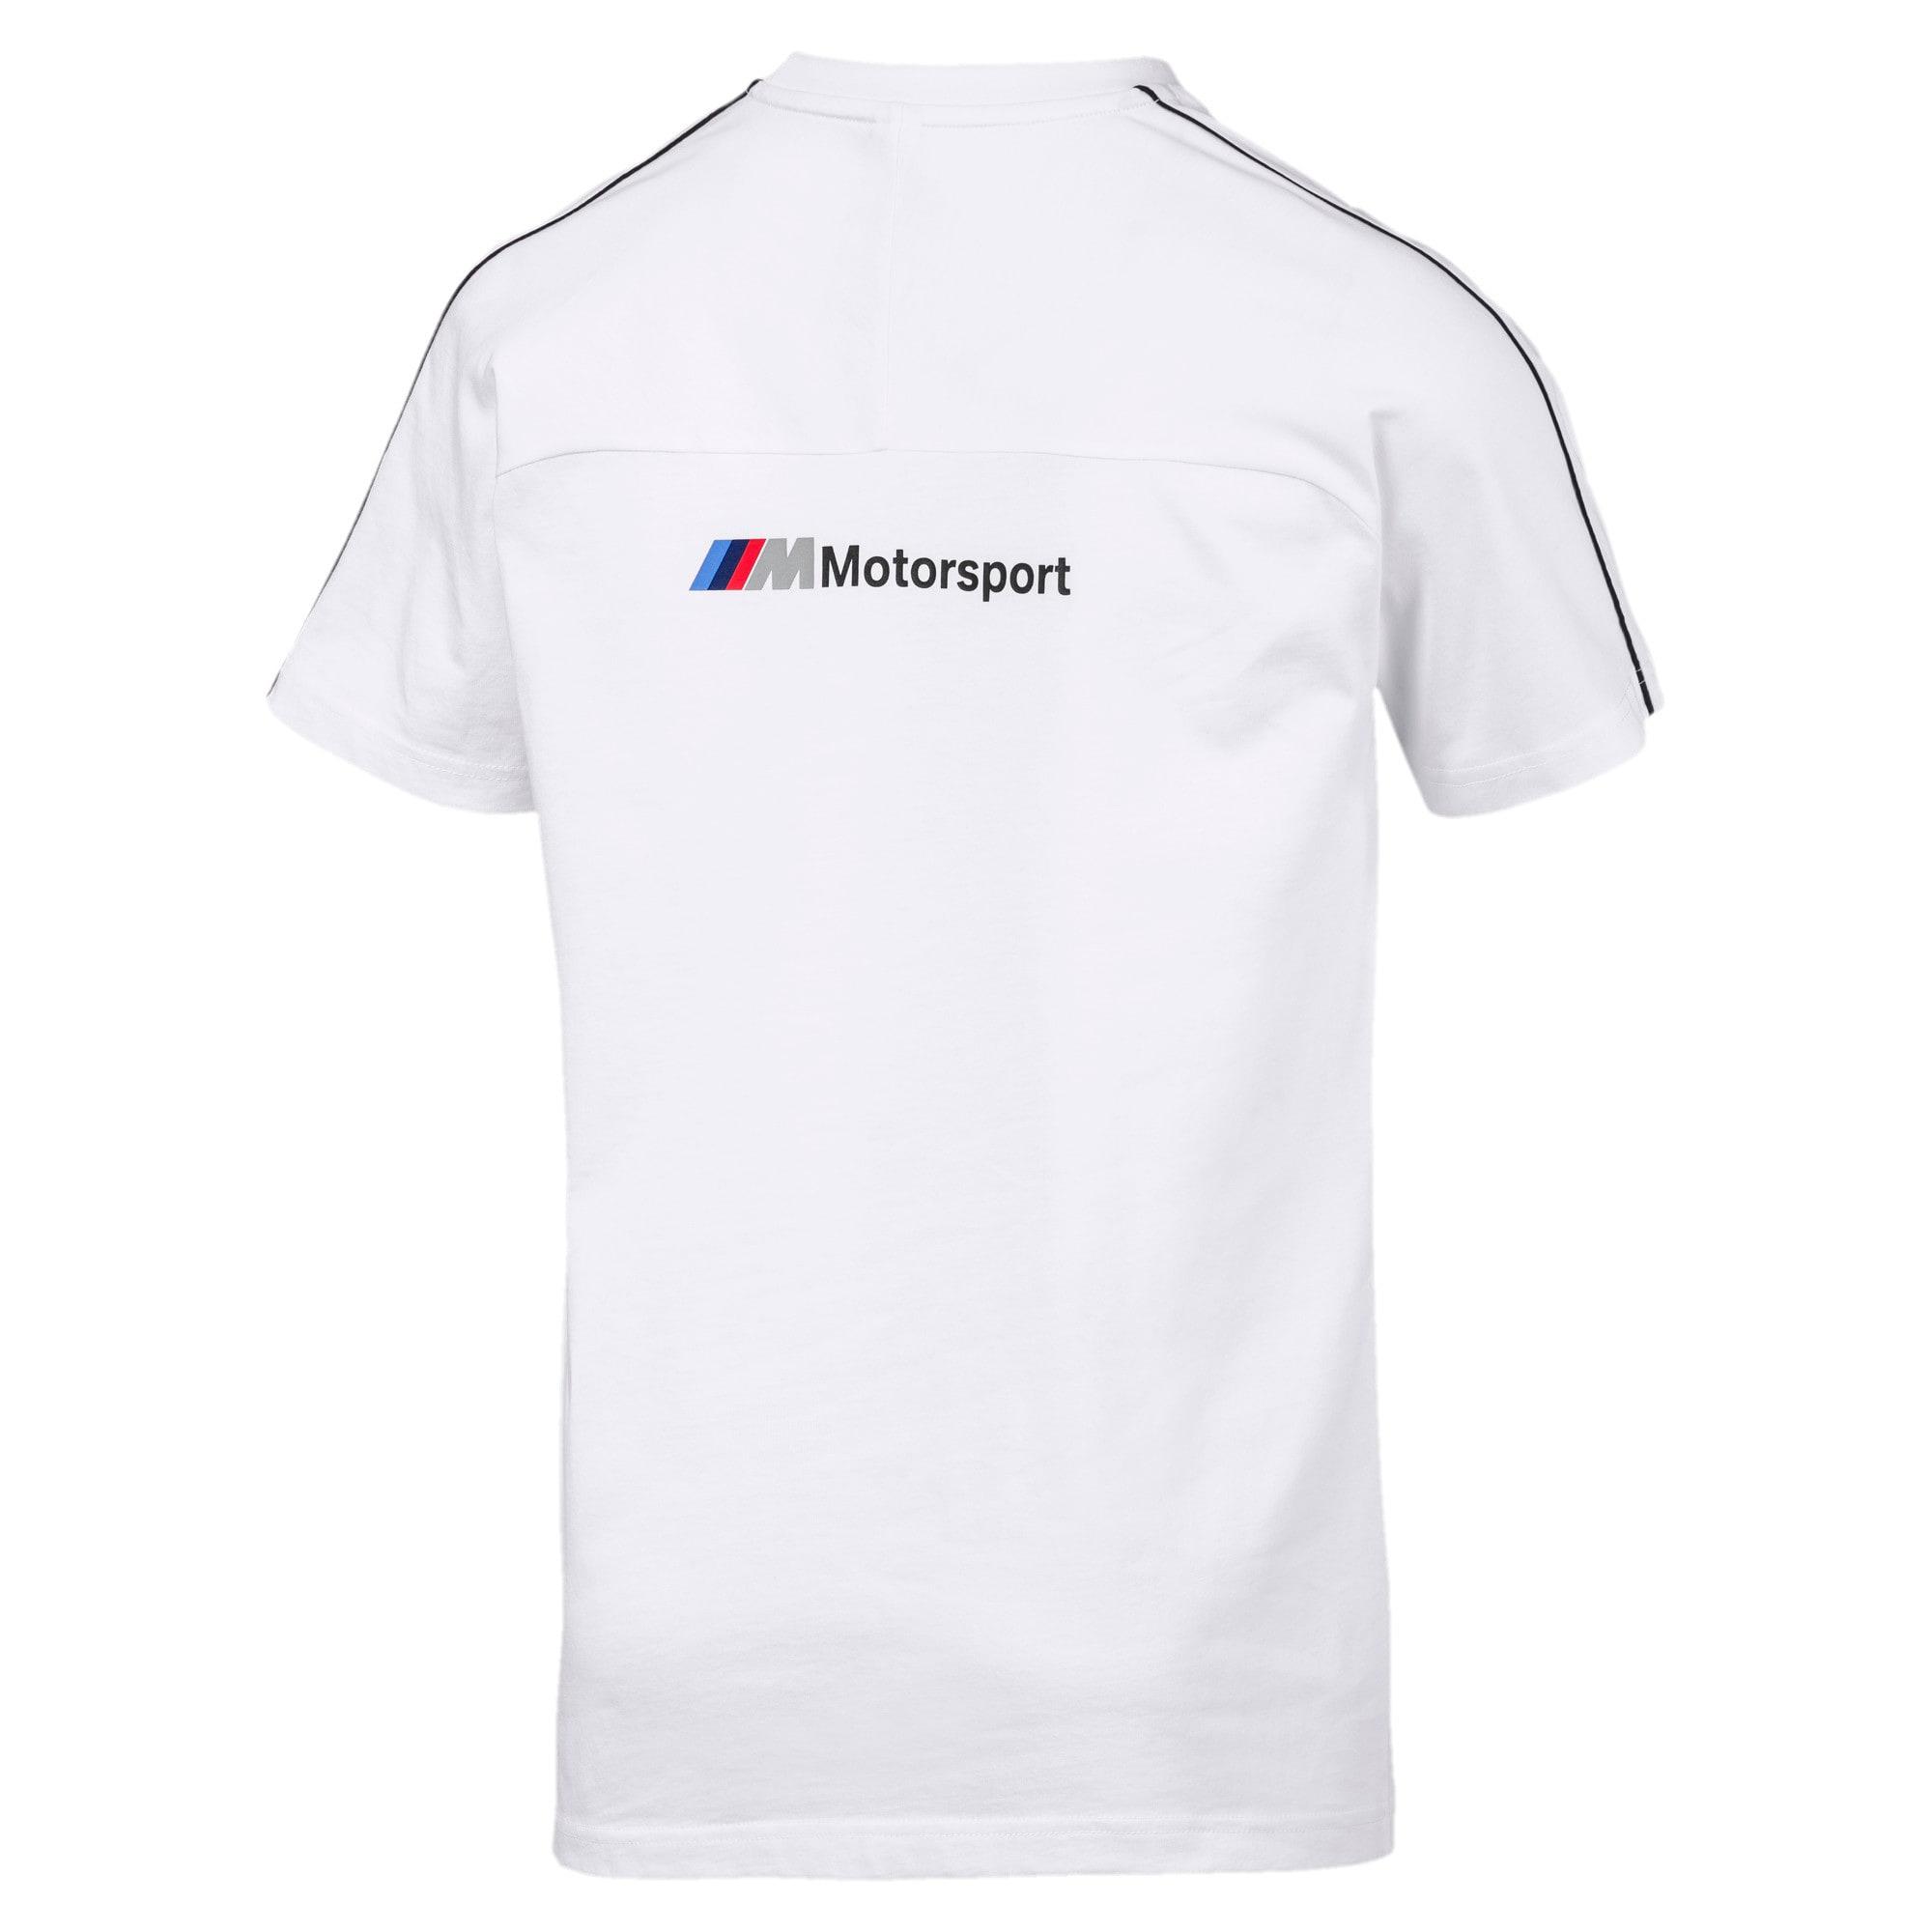 Thumbnail 5 of BMW M Motorsport T7 T-shirt voor heren, Puma White, medium